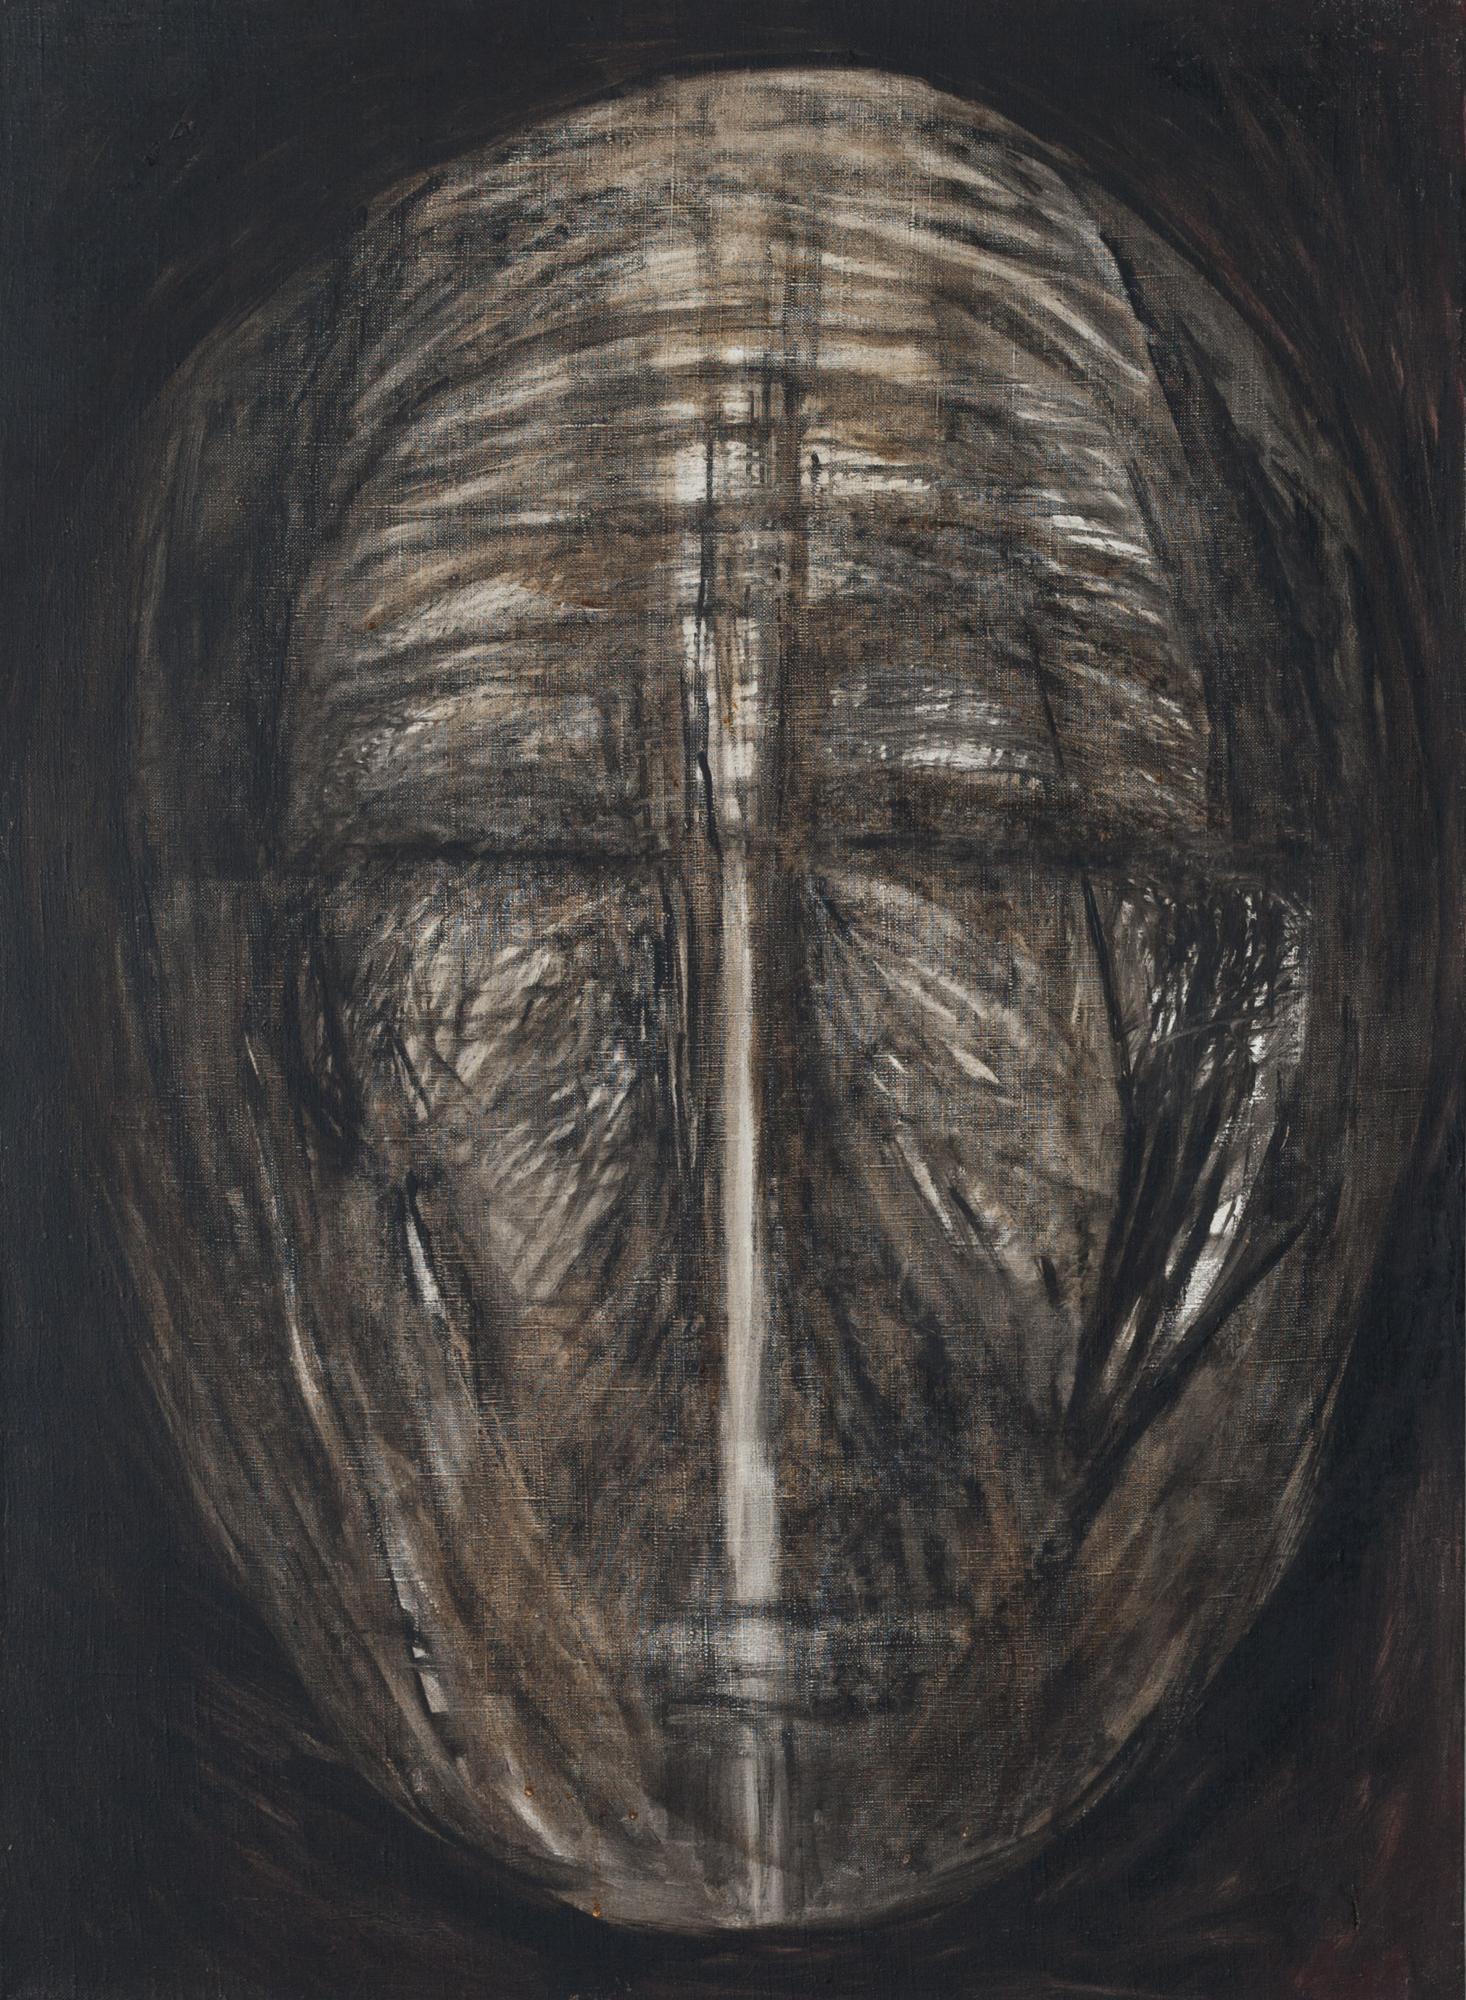 Abakanowicz_Galerie_Zavodny2.jpg